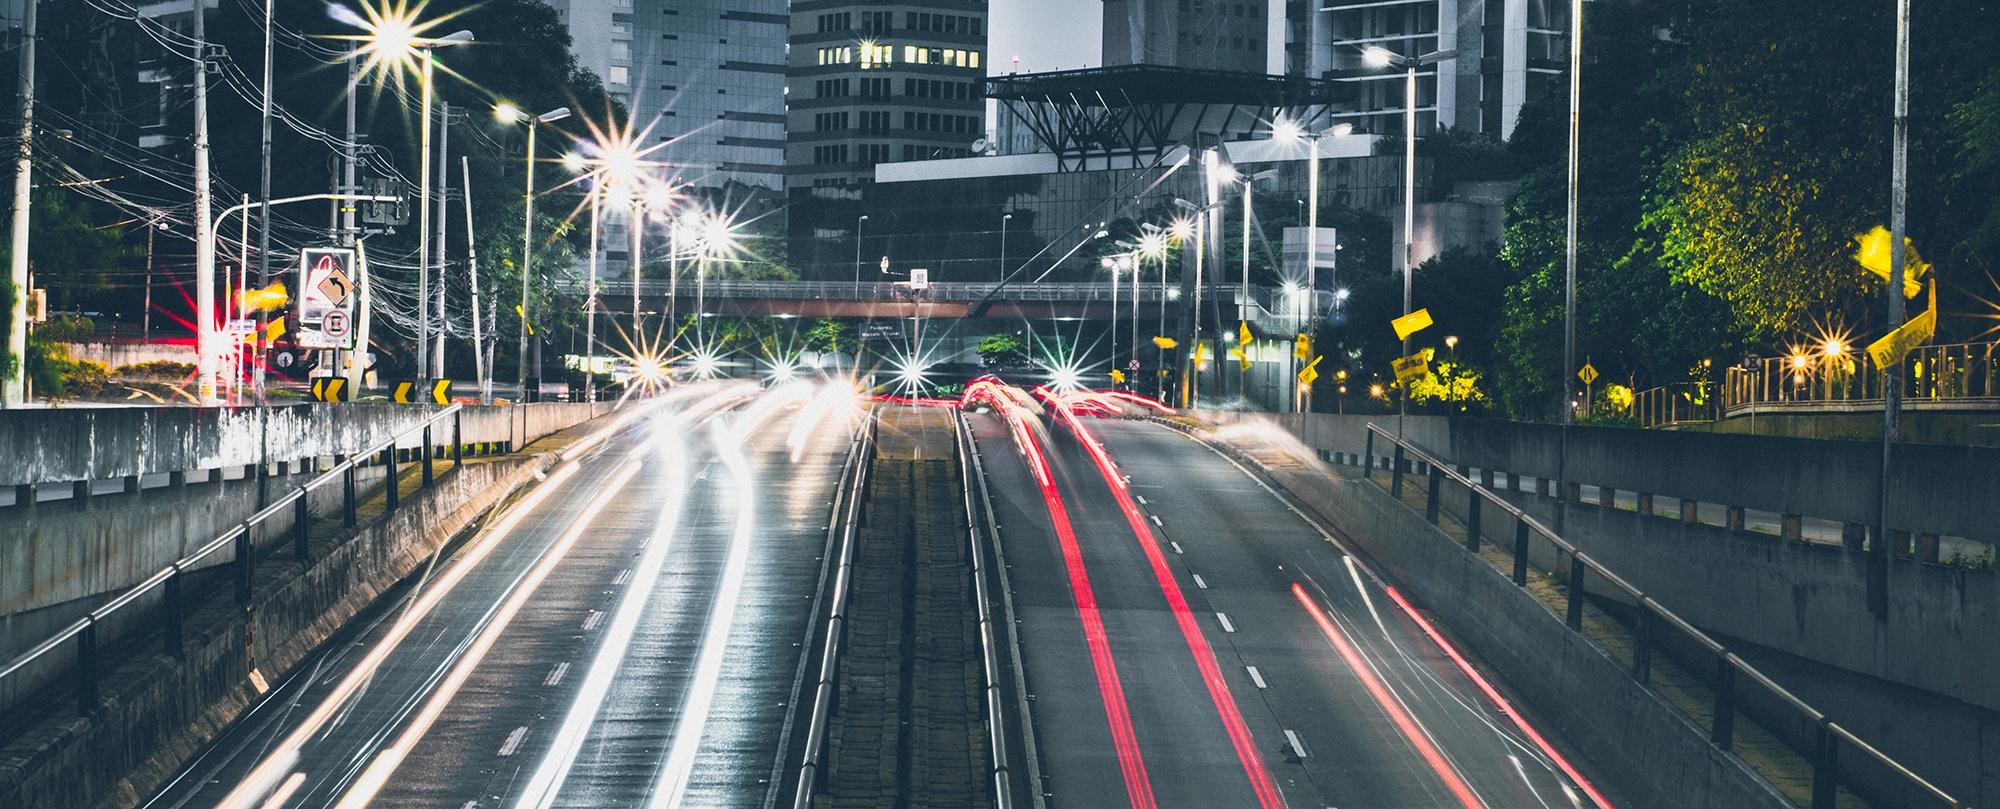 Victorian Police to suspend 8000 speeding tickets due to WannaCry